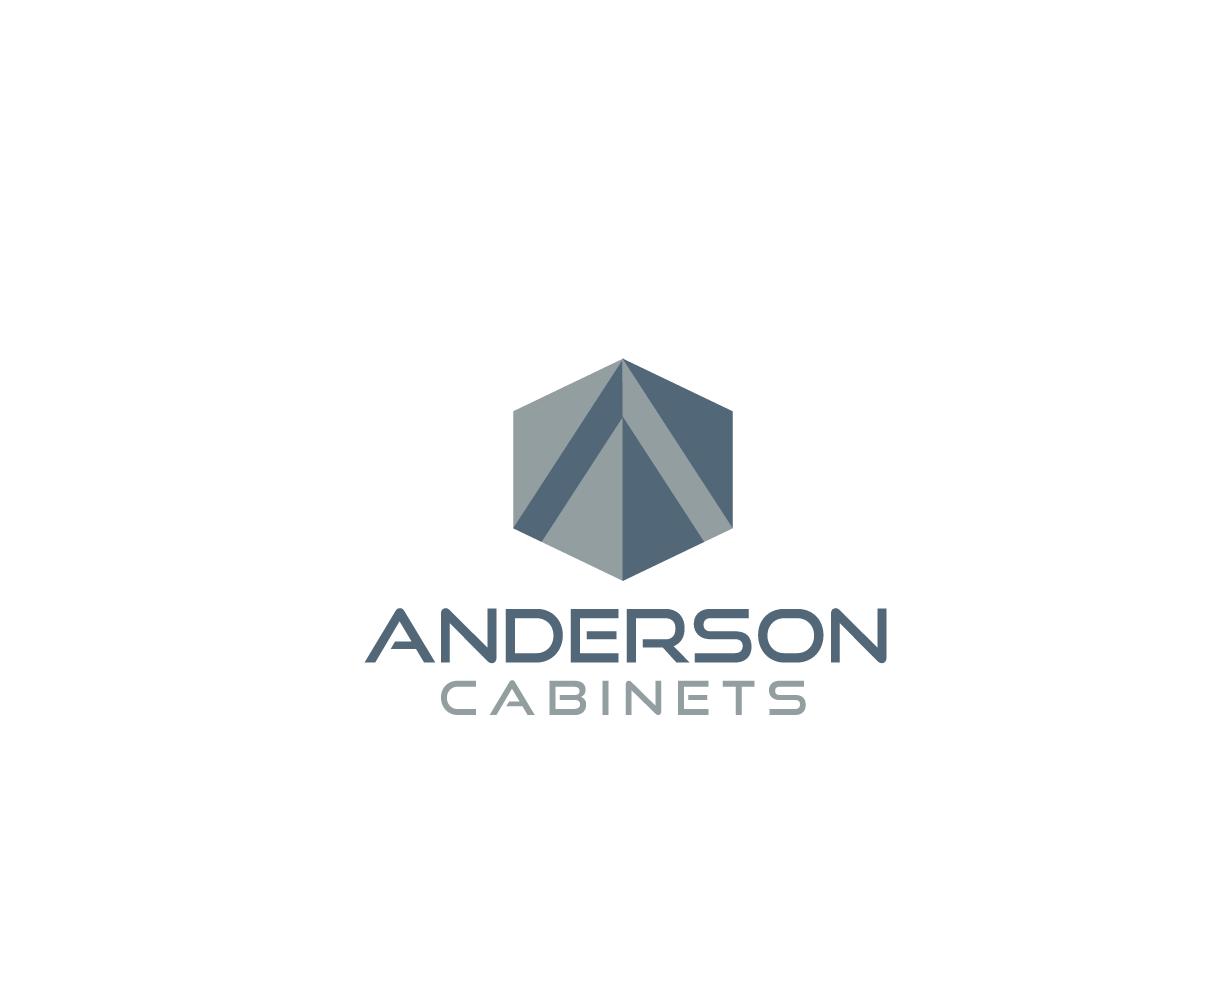 Logo Design By Costur For Anderson Cabinets   Design #17203919